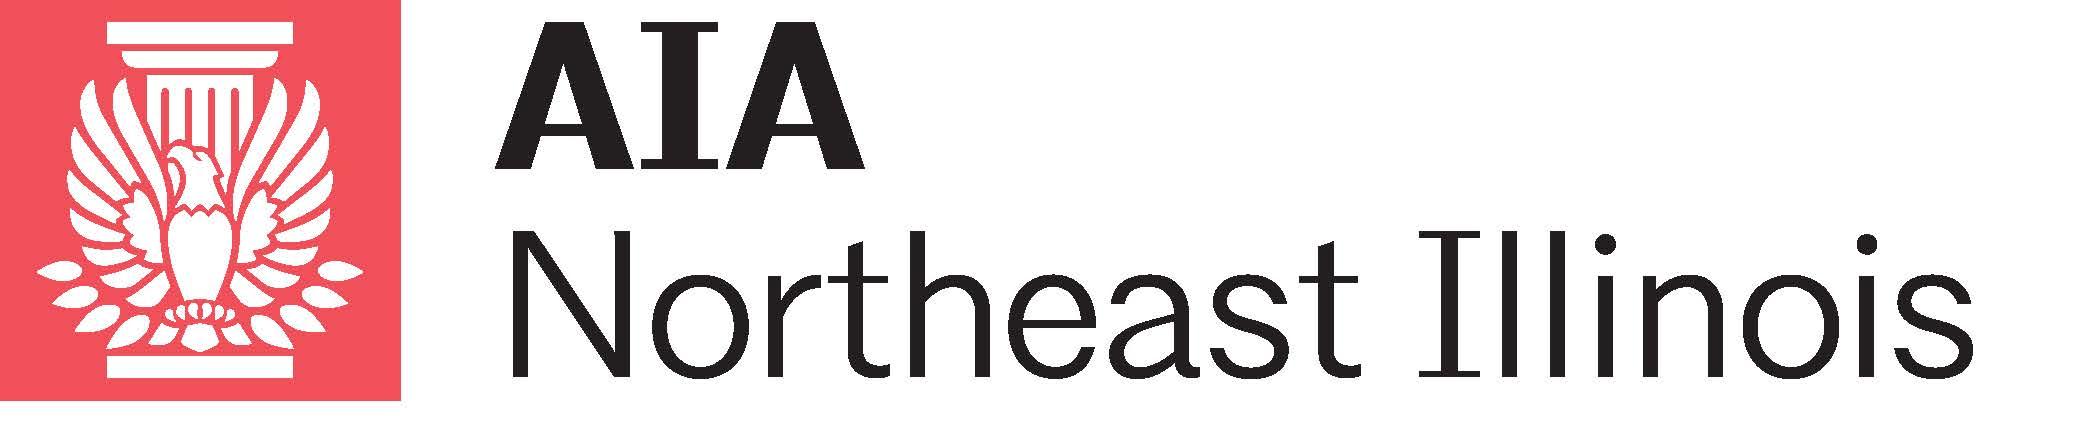 AIA_Northeast_Illinois_logo_PMS